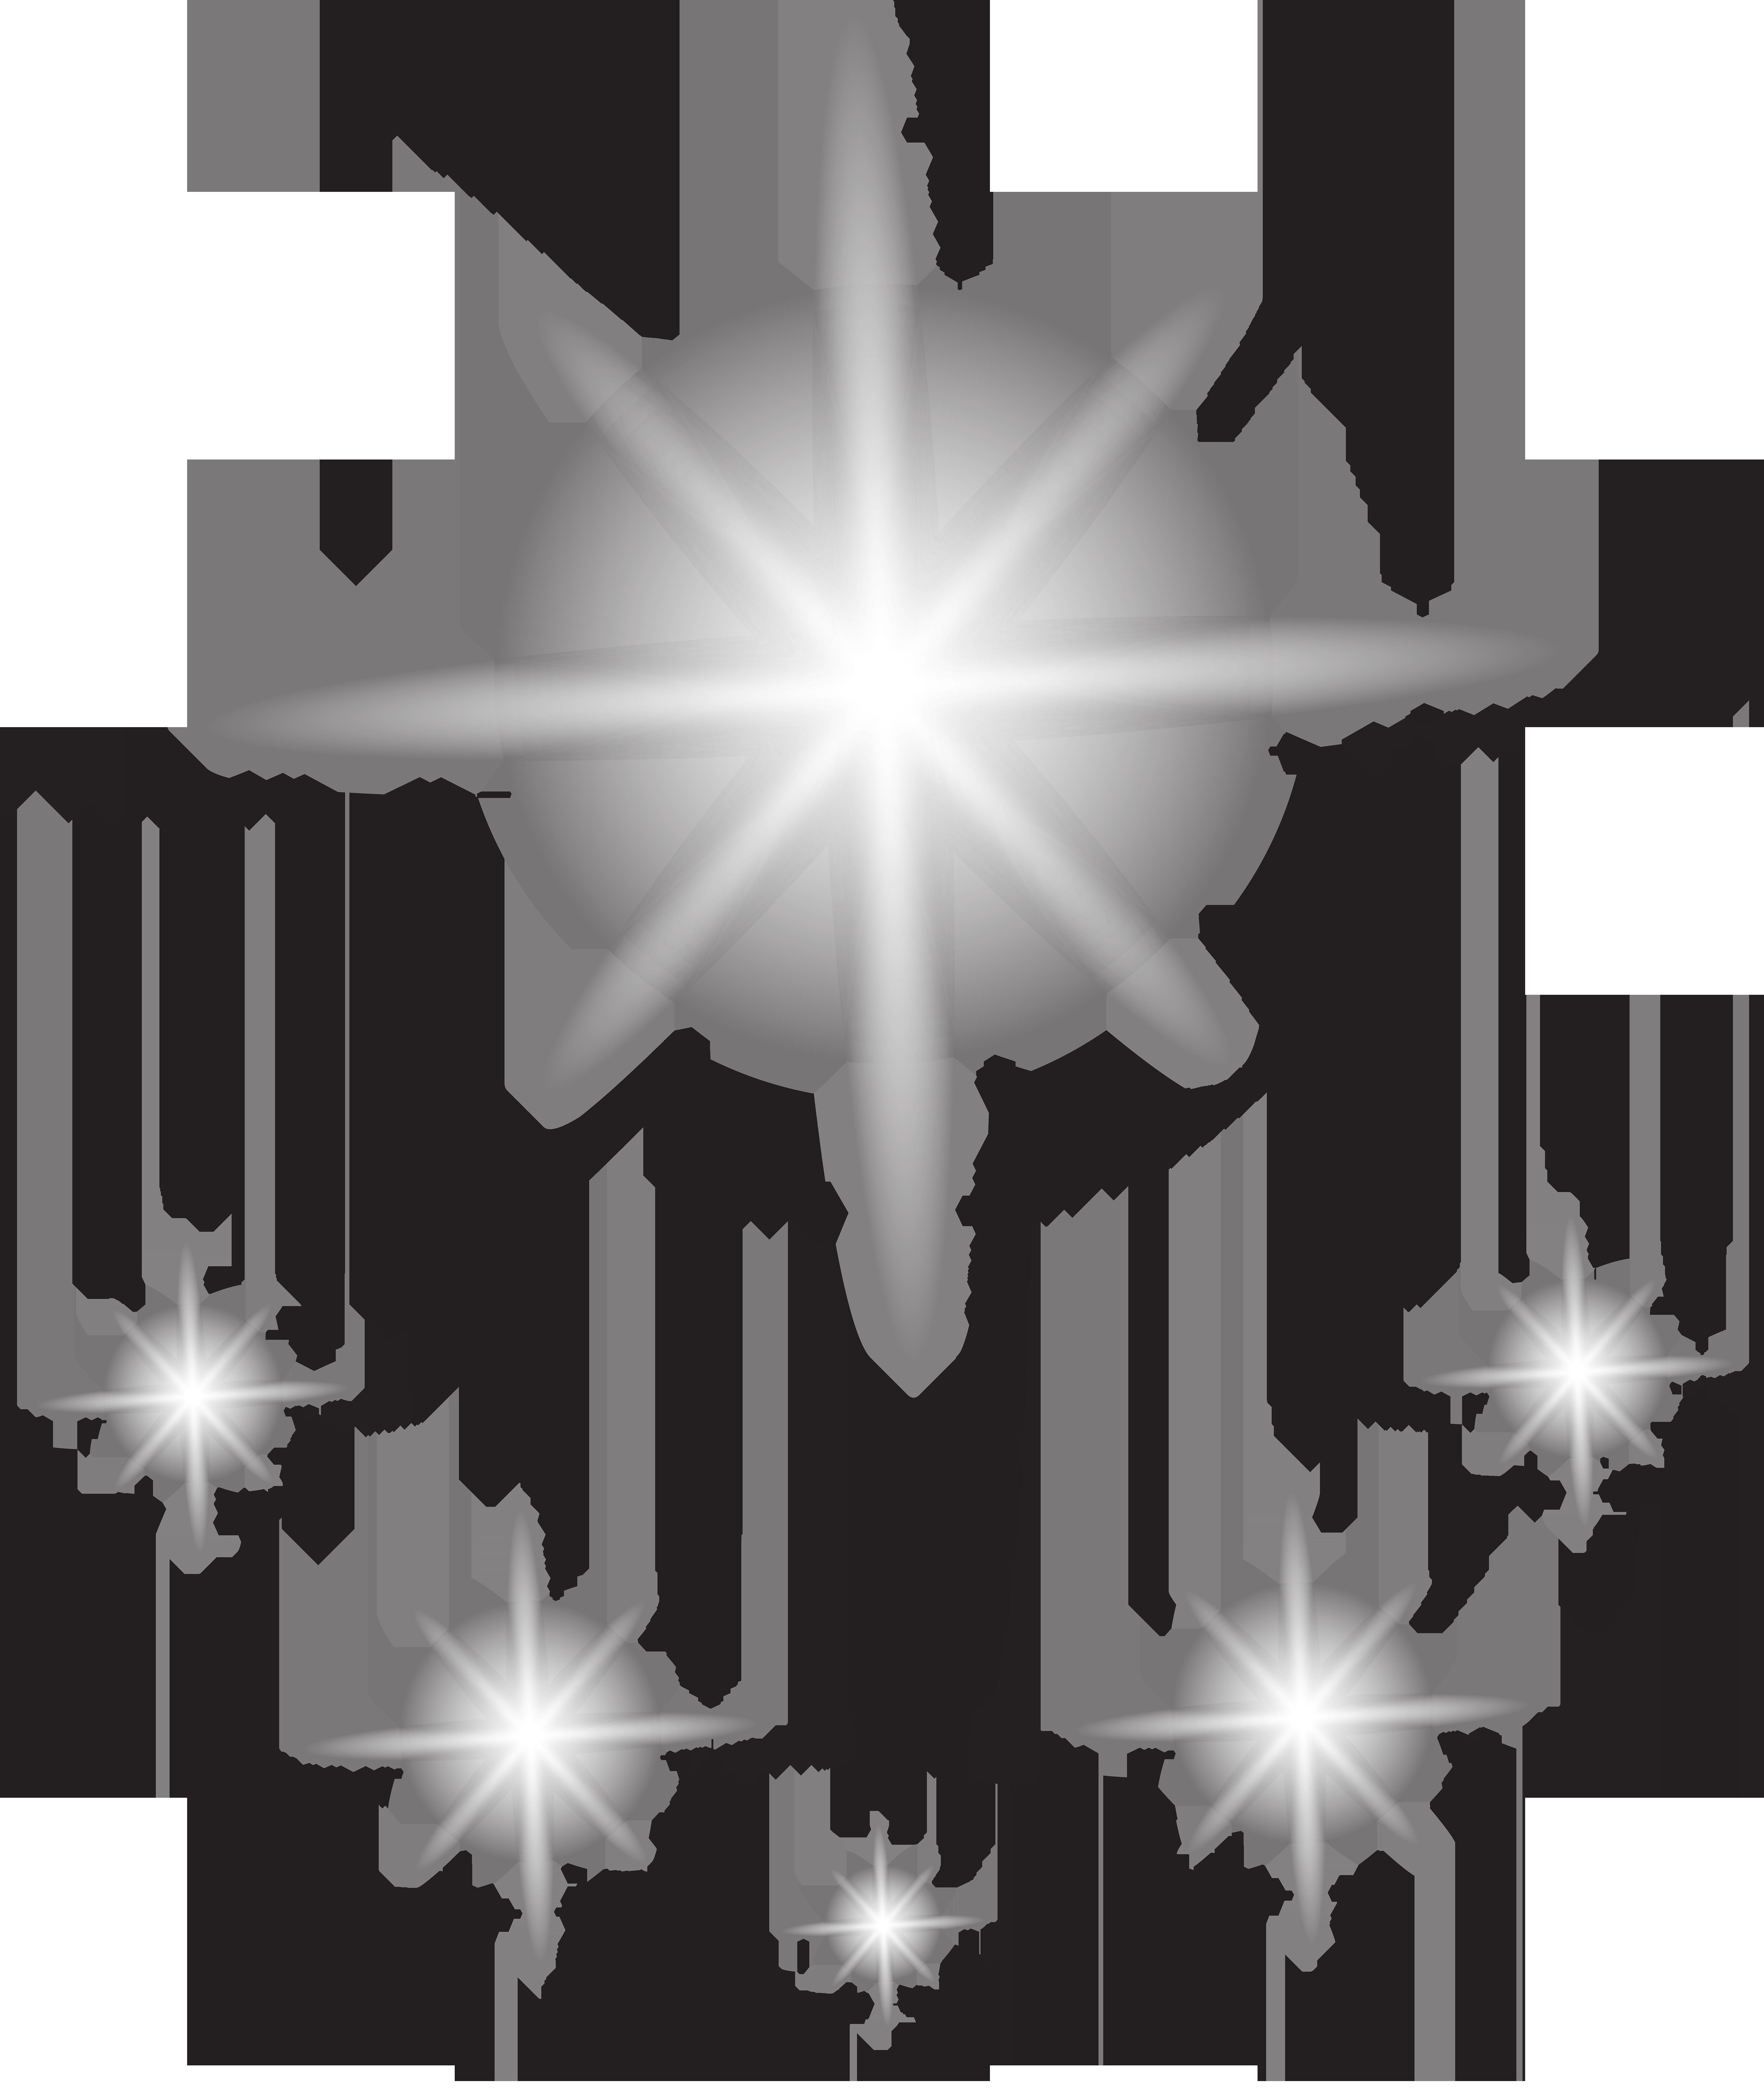 Shining Stars Effect Transparent Png Clip Art Image Gallery Yopriceville High Quality Images And Transparent Png Free Clipart Oboi Vinilovye Oboi Dekor